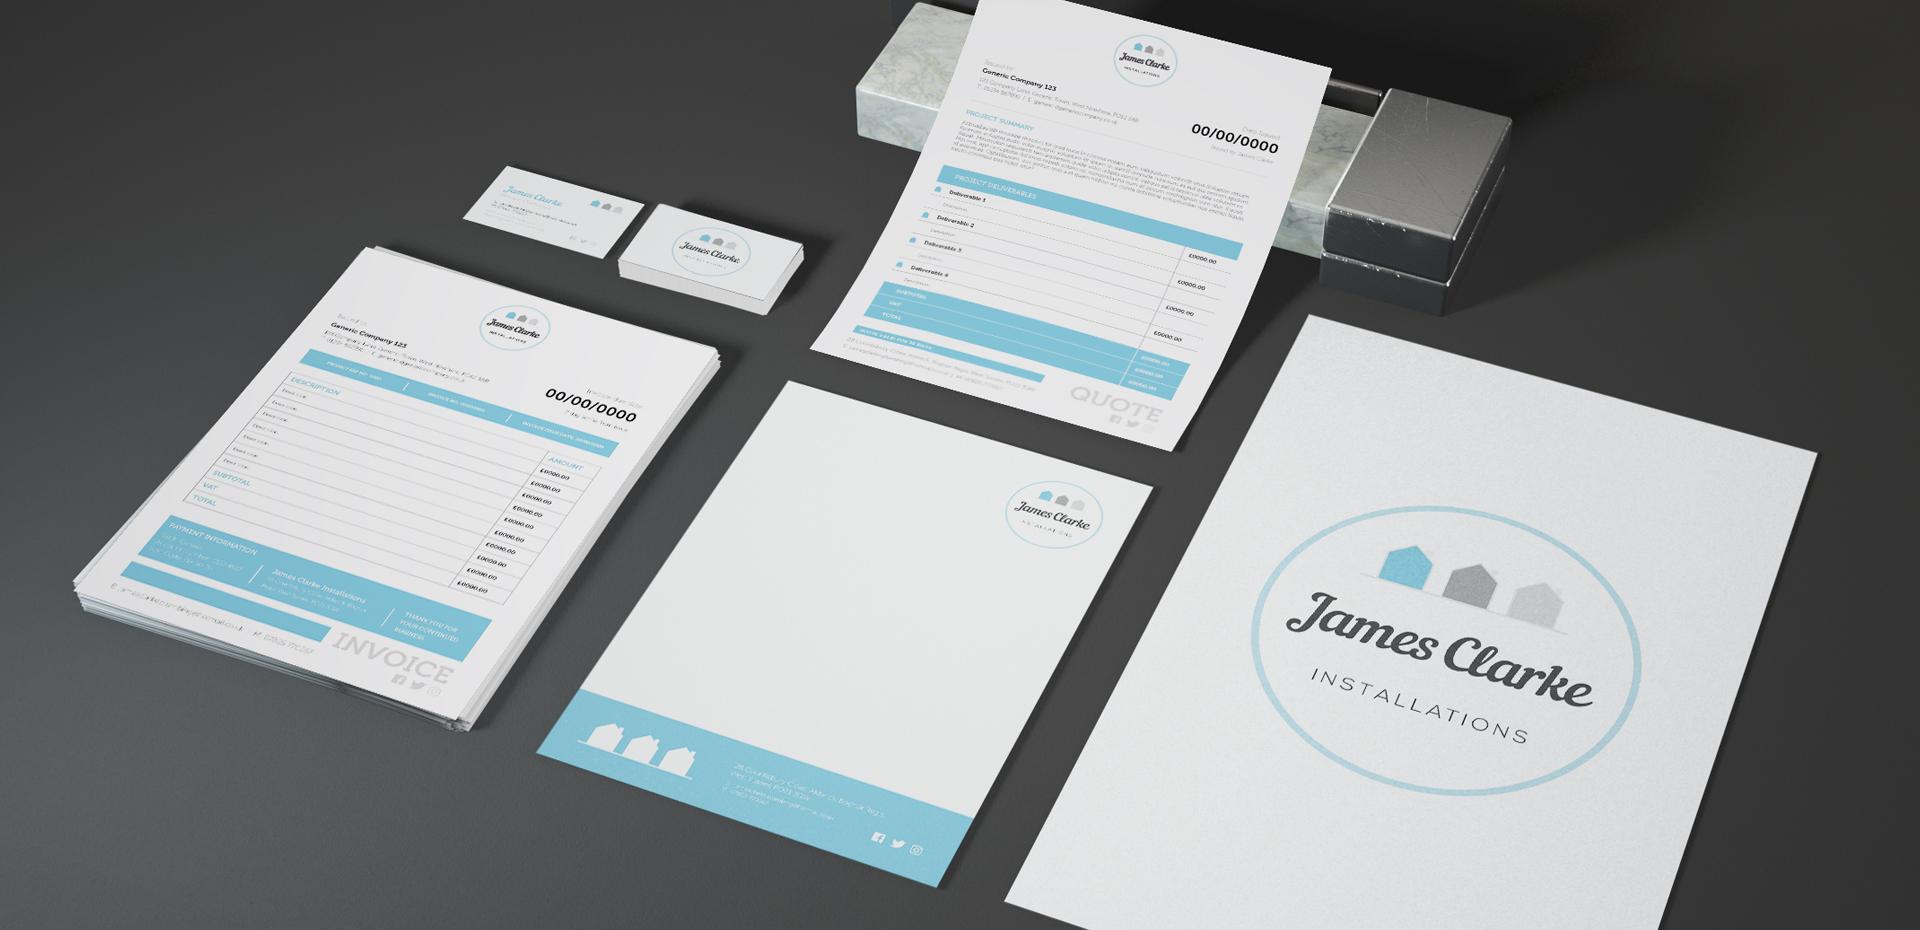 James Clarke Installations brand suite illustrating branded stationery